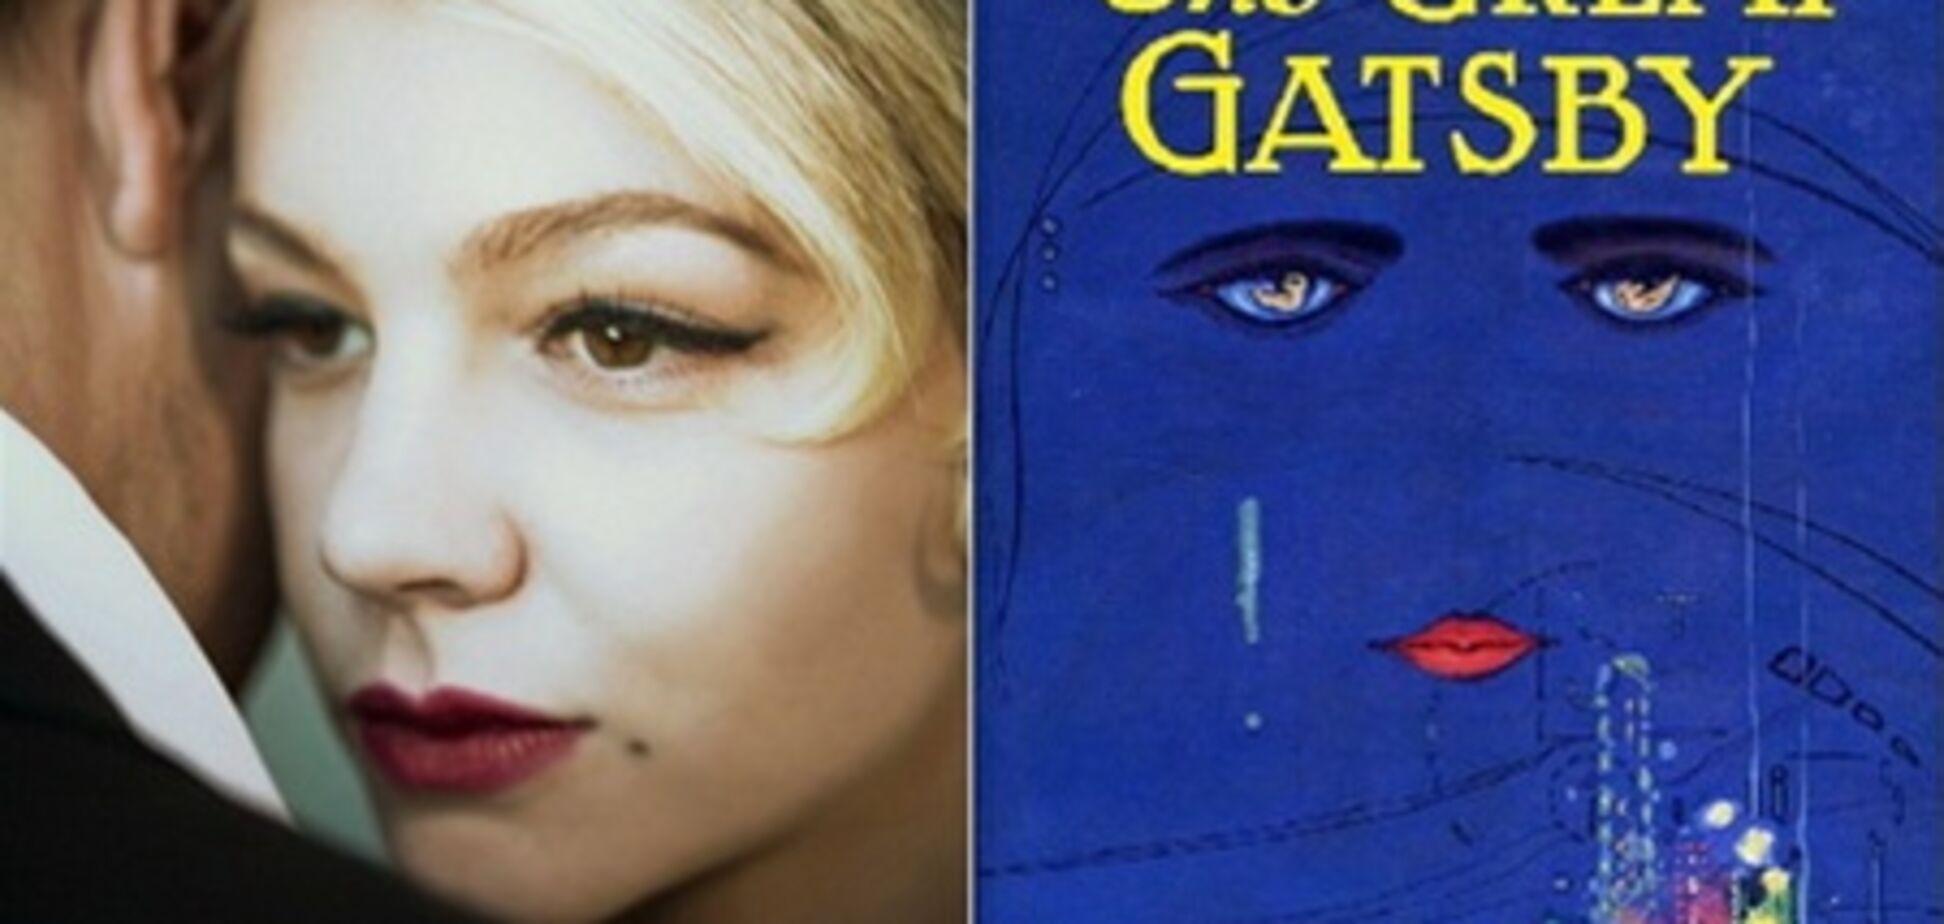 Съемки «Великого Гэтсби» 3D начнутся в августе